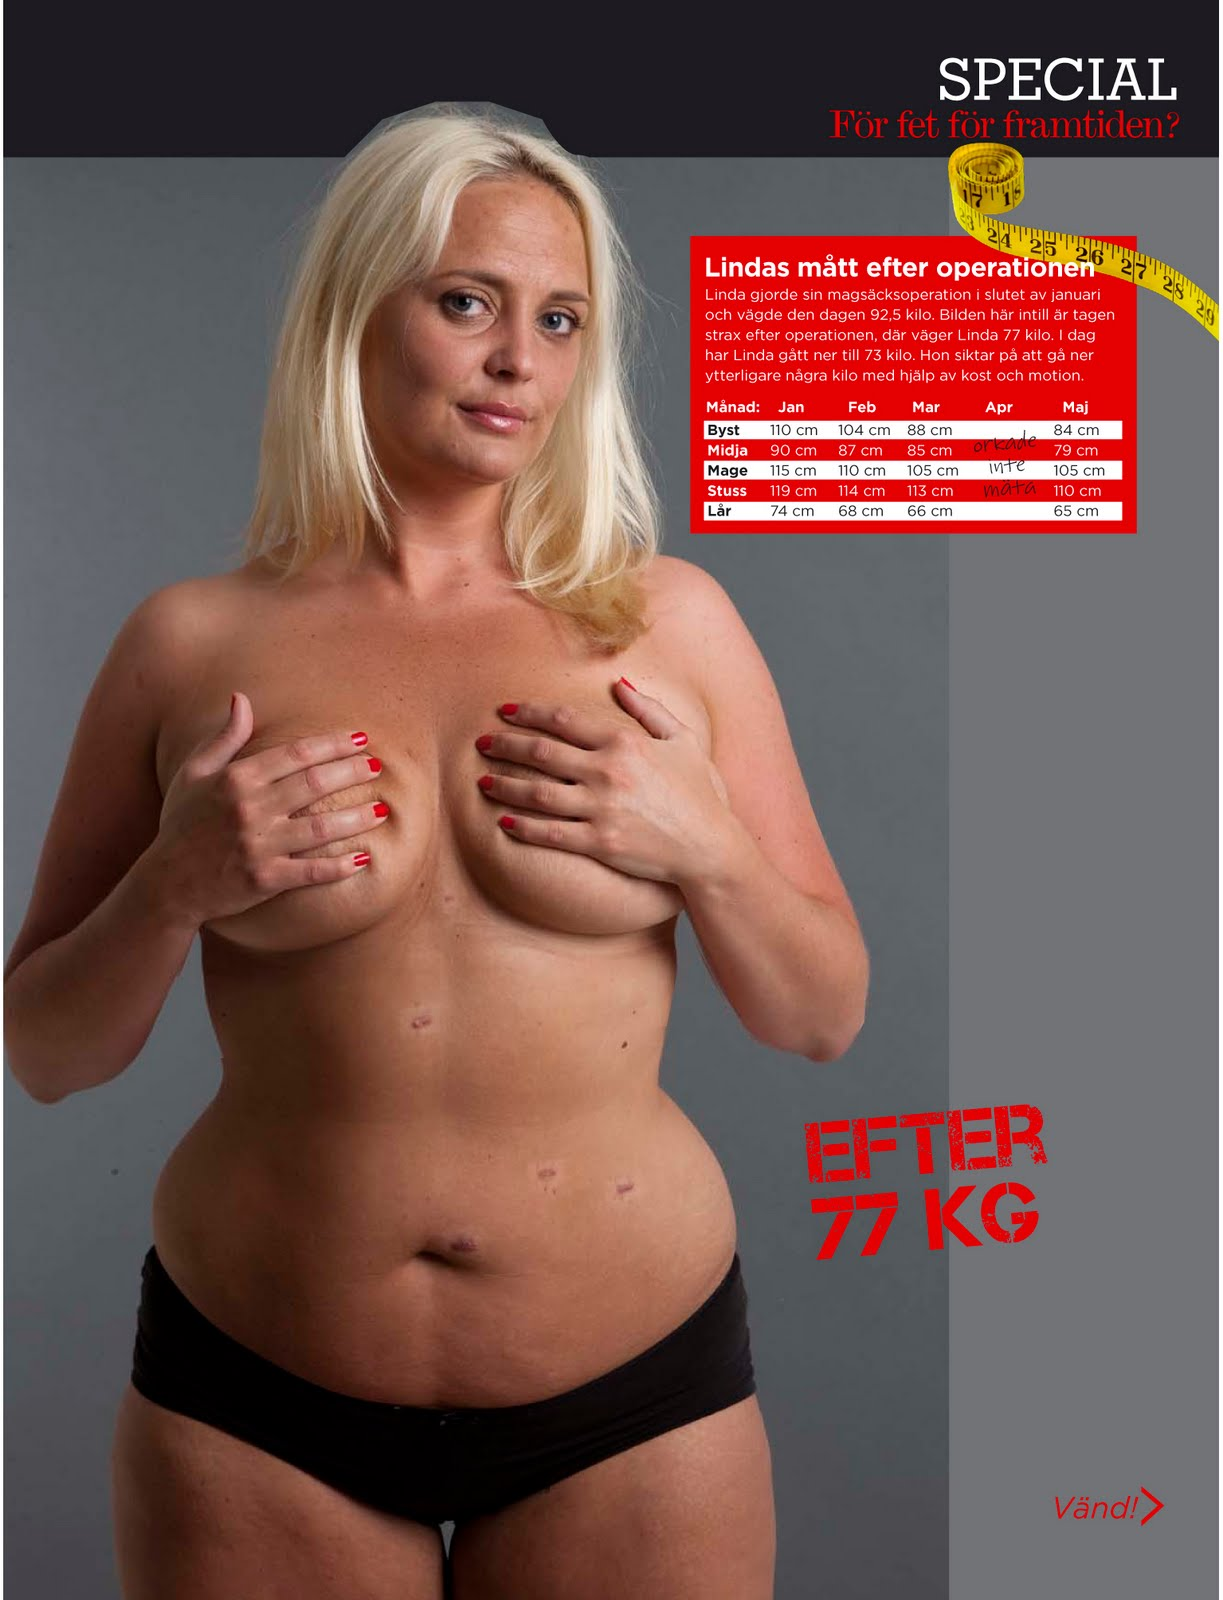 bilder på äldre nakna kvinnor svenska nakna tjejer